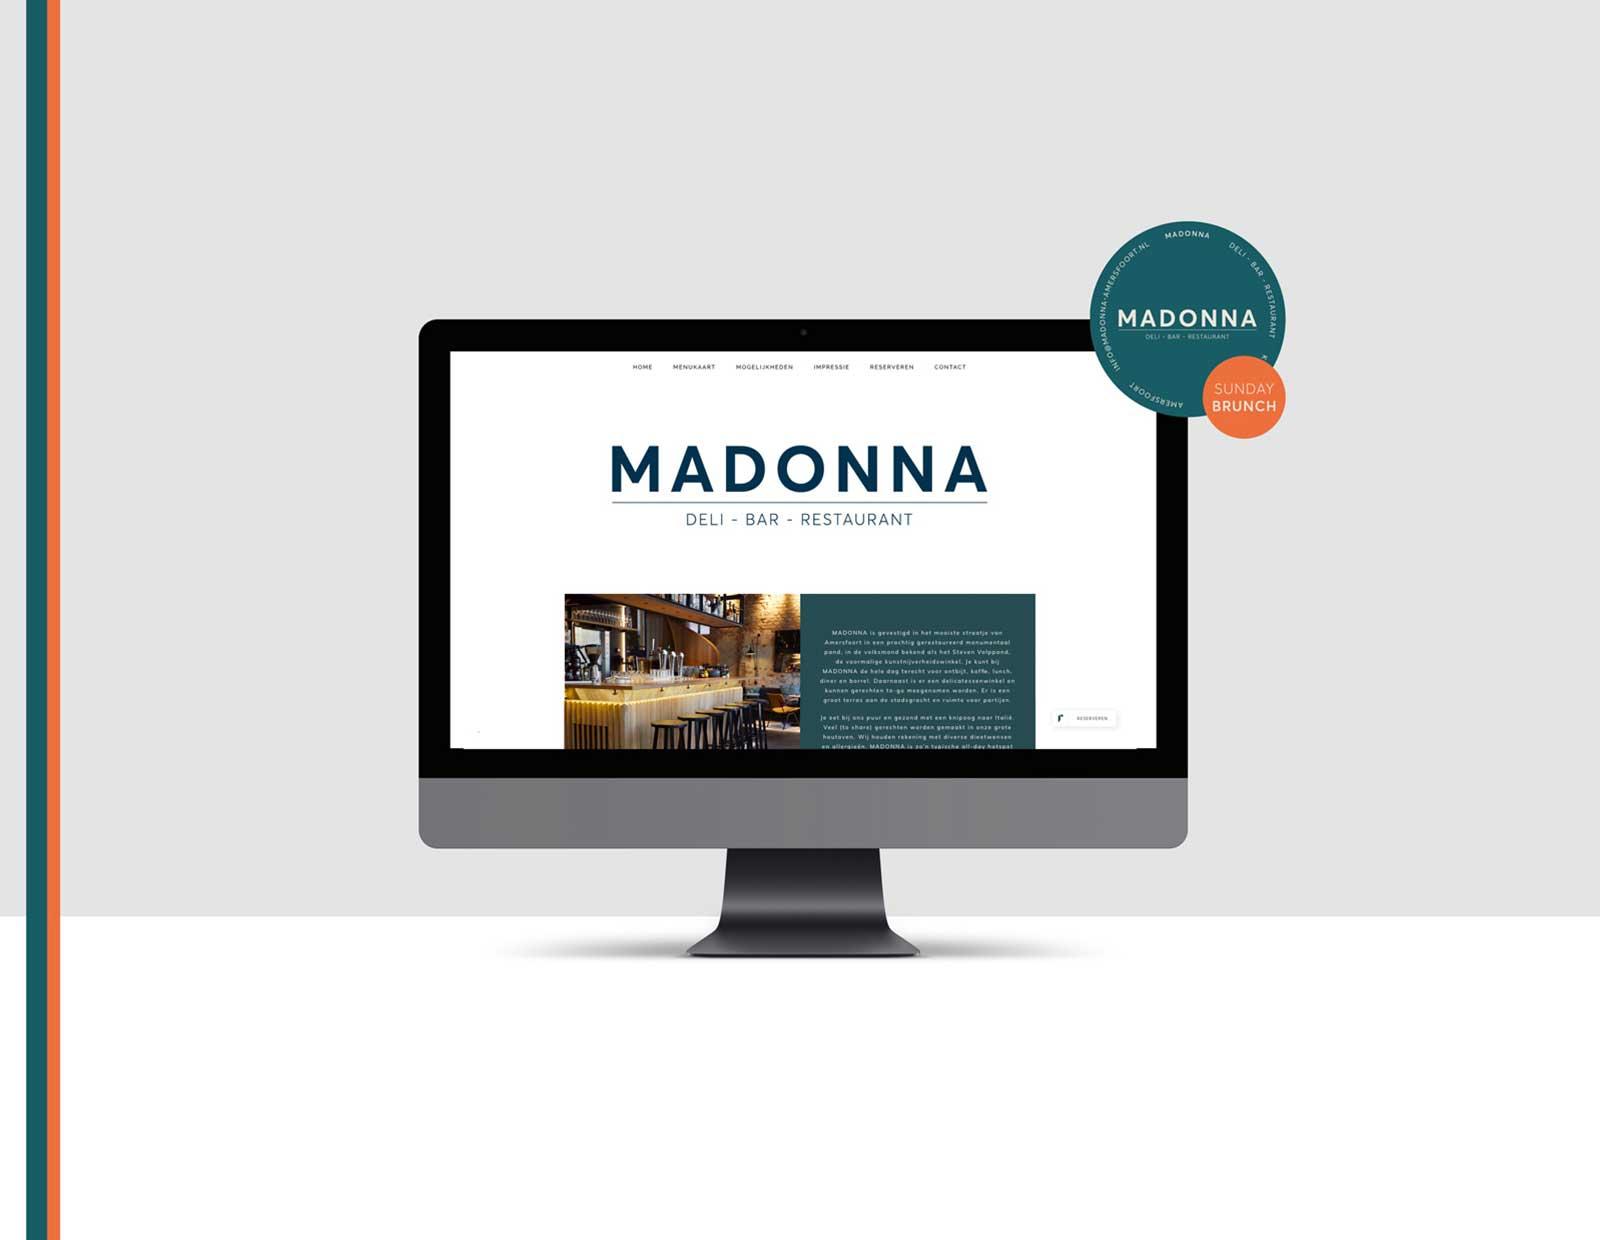 Madonna-website